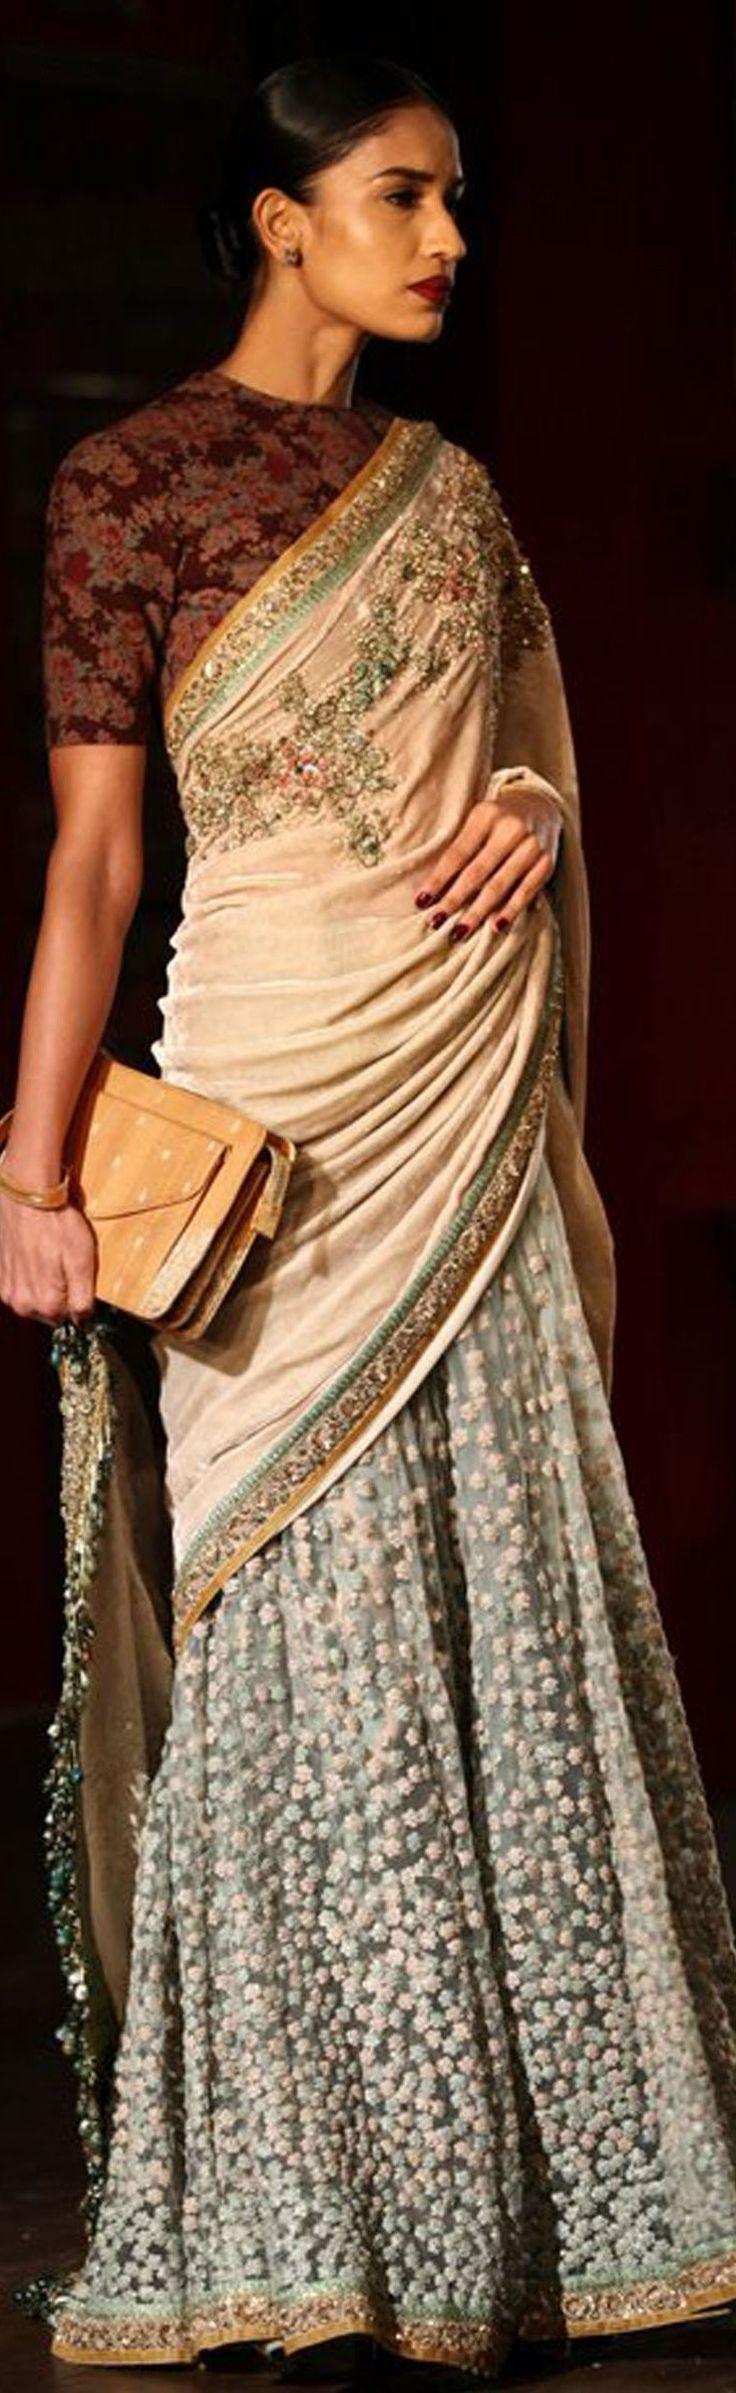 Sabyasachi saree /Amazon india fashion week/   ♒Revathy♒ [[Sabyasachi~❤。An Exquisite Clothing]]